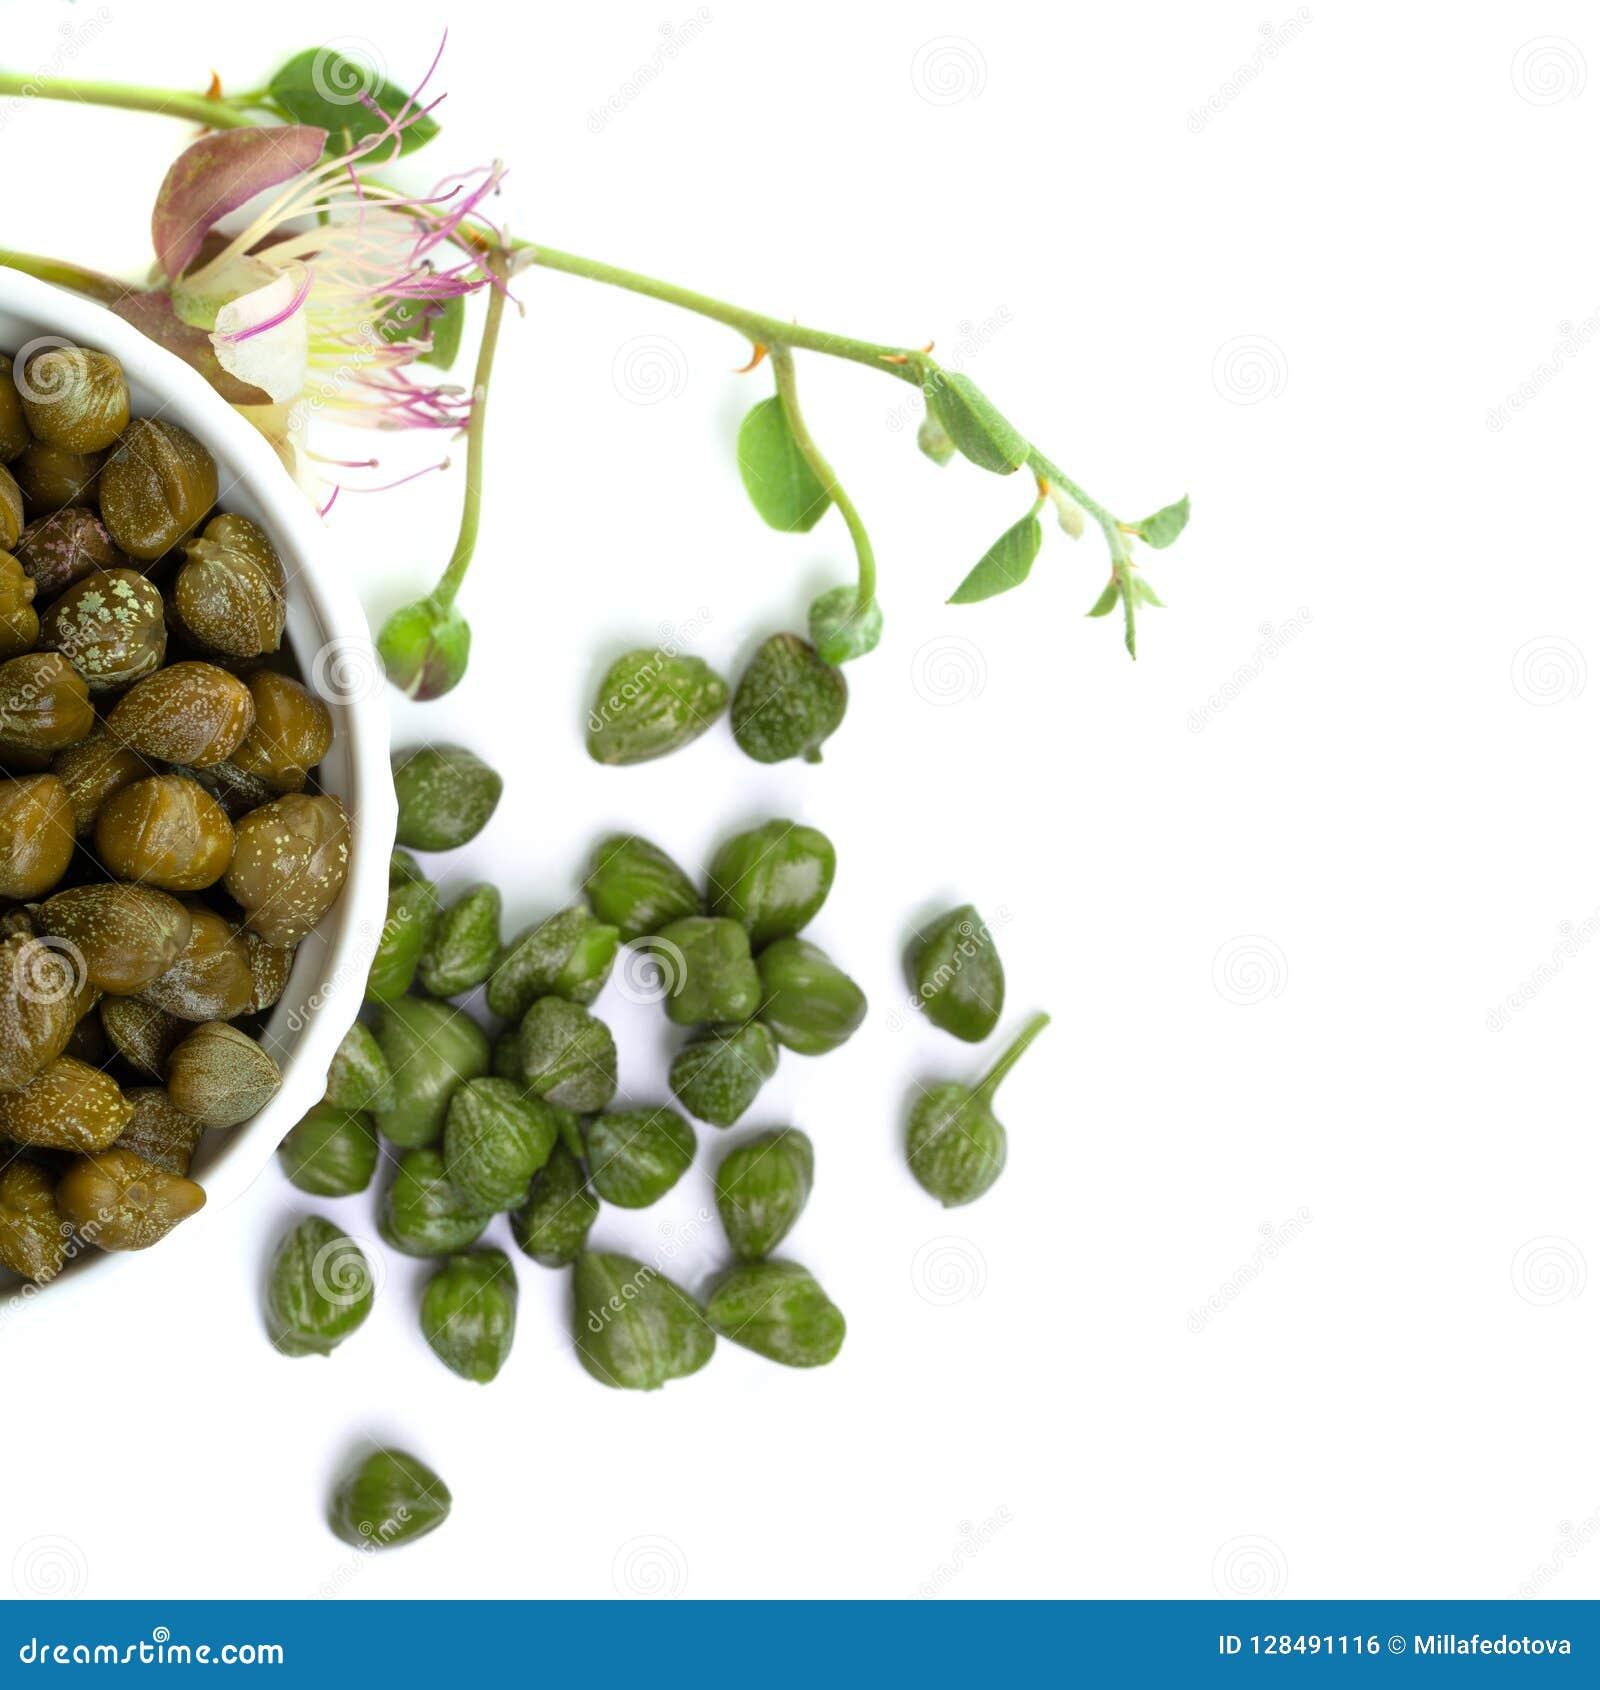 Kapary Kiszeni kapary, surowy pączek i kapar roślina,